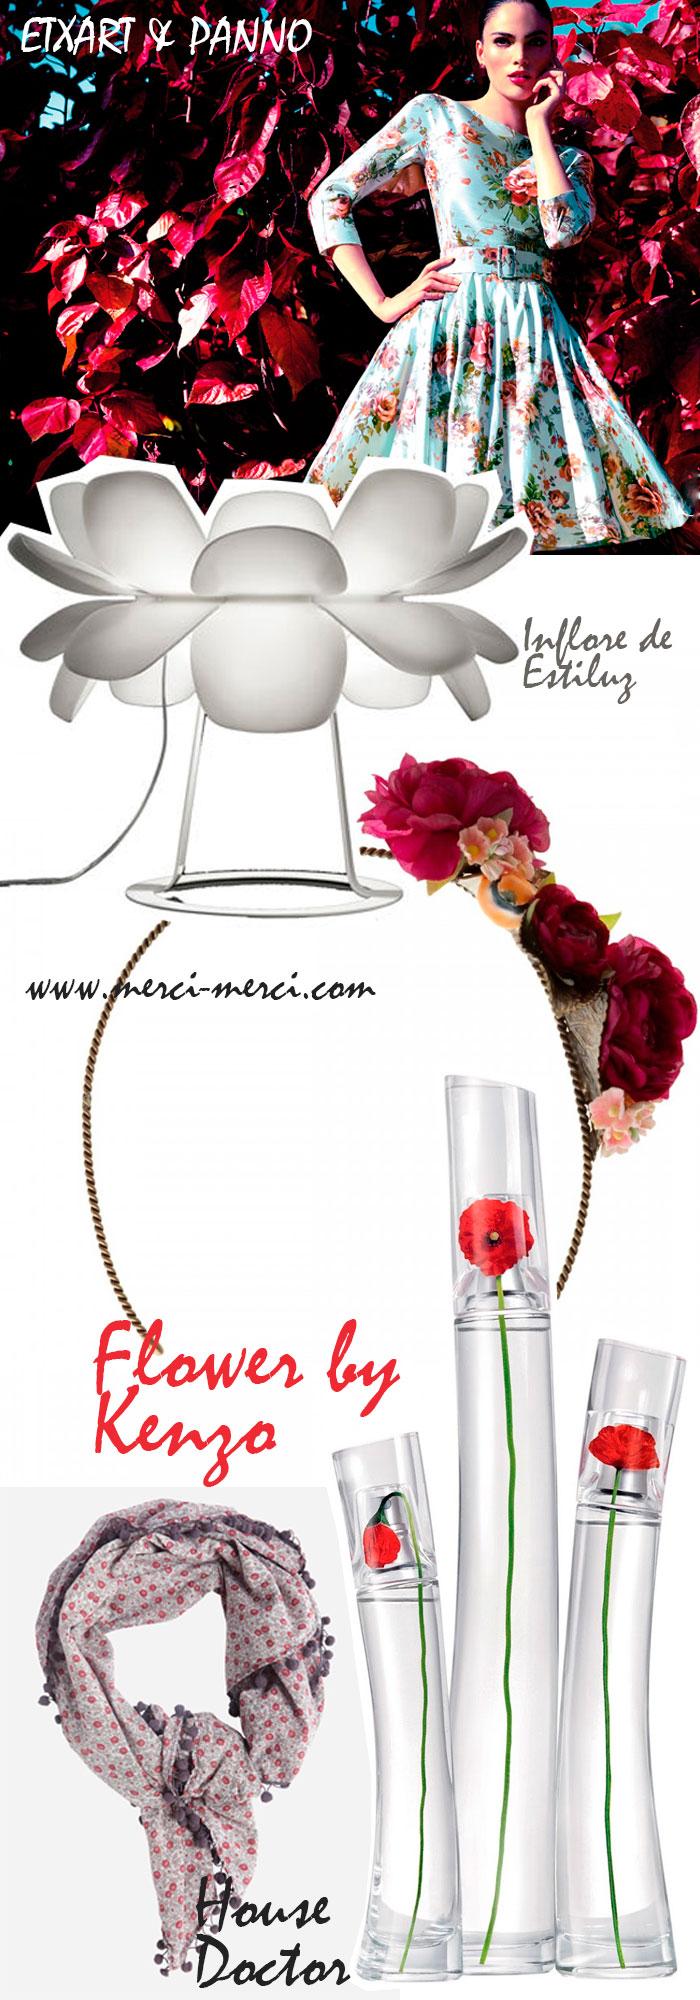 FLOWER BY KENZO, ETXART & PANNO, MERCI MERCI, ESTILUZ